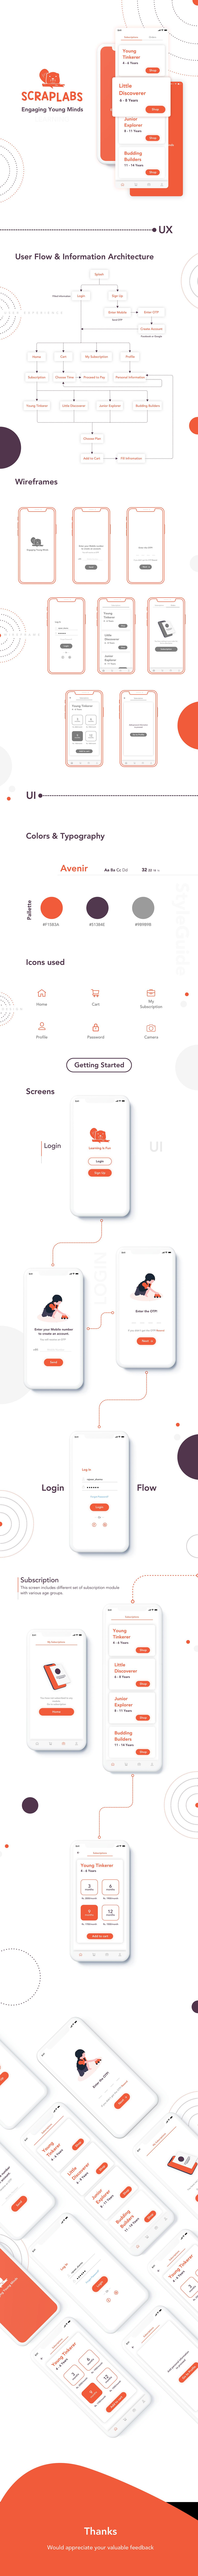 UX Research Education student UI design process minimal ui kit learning app kids app iphonex